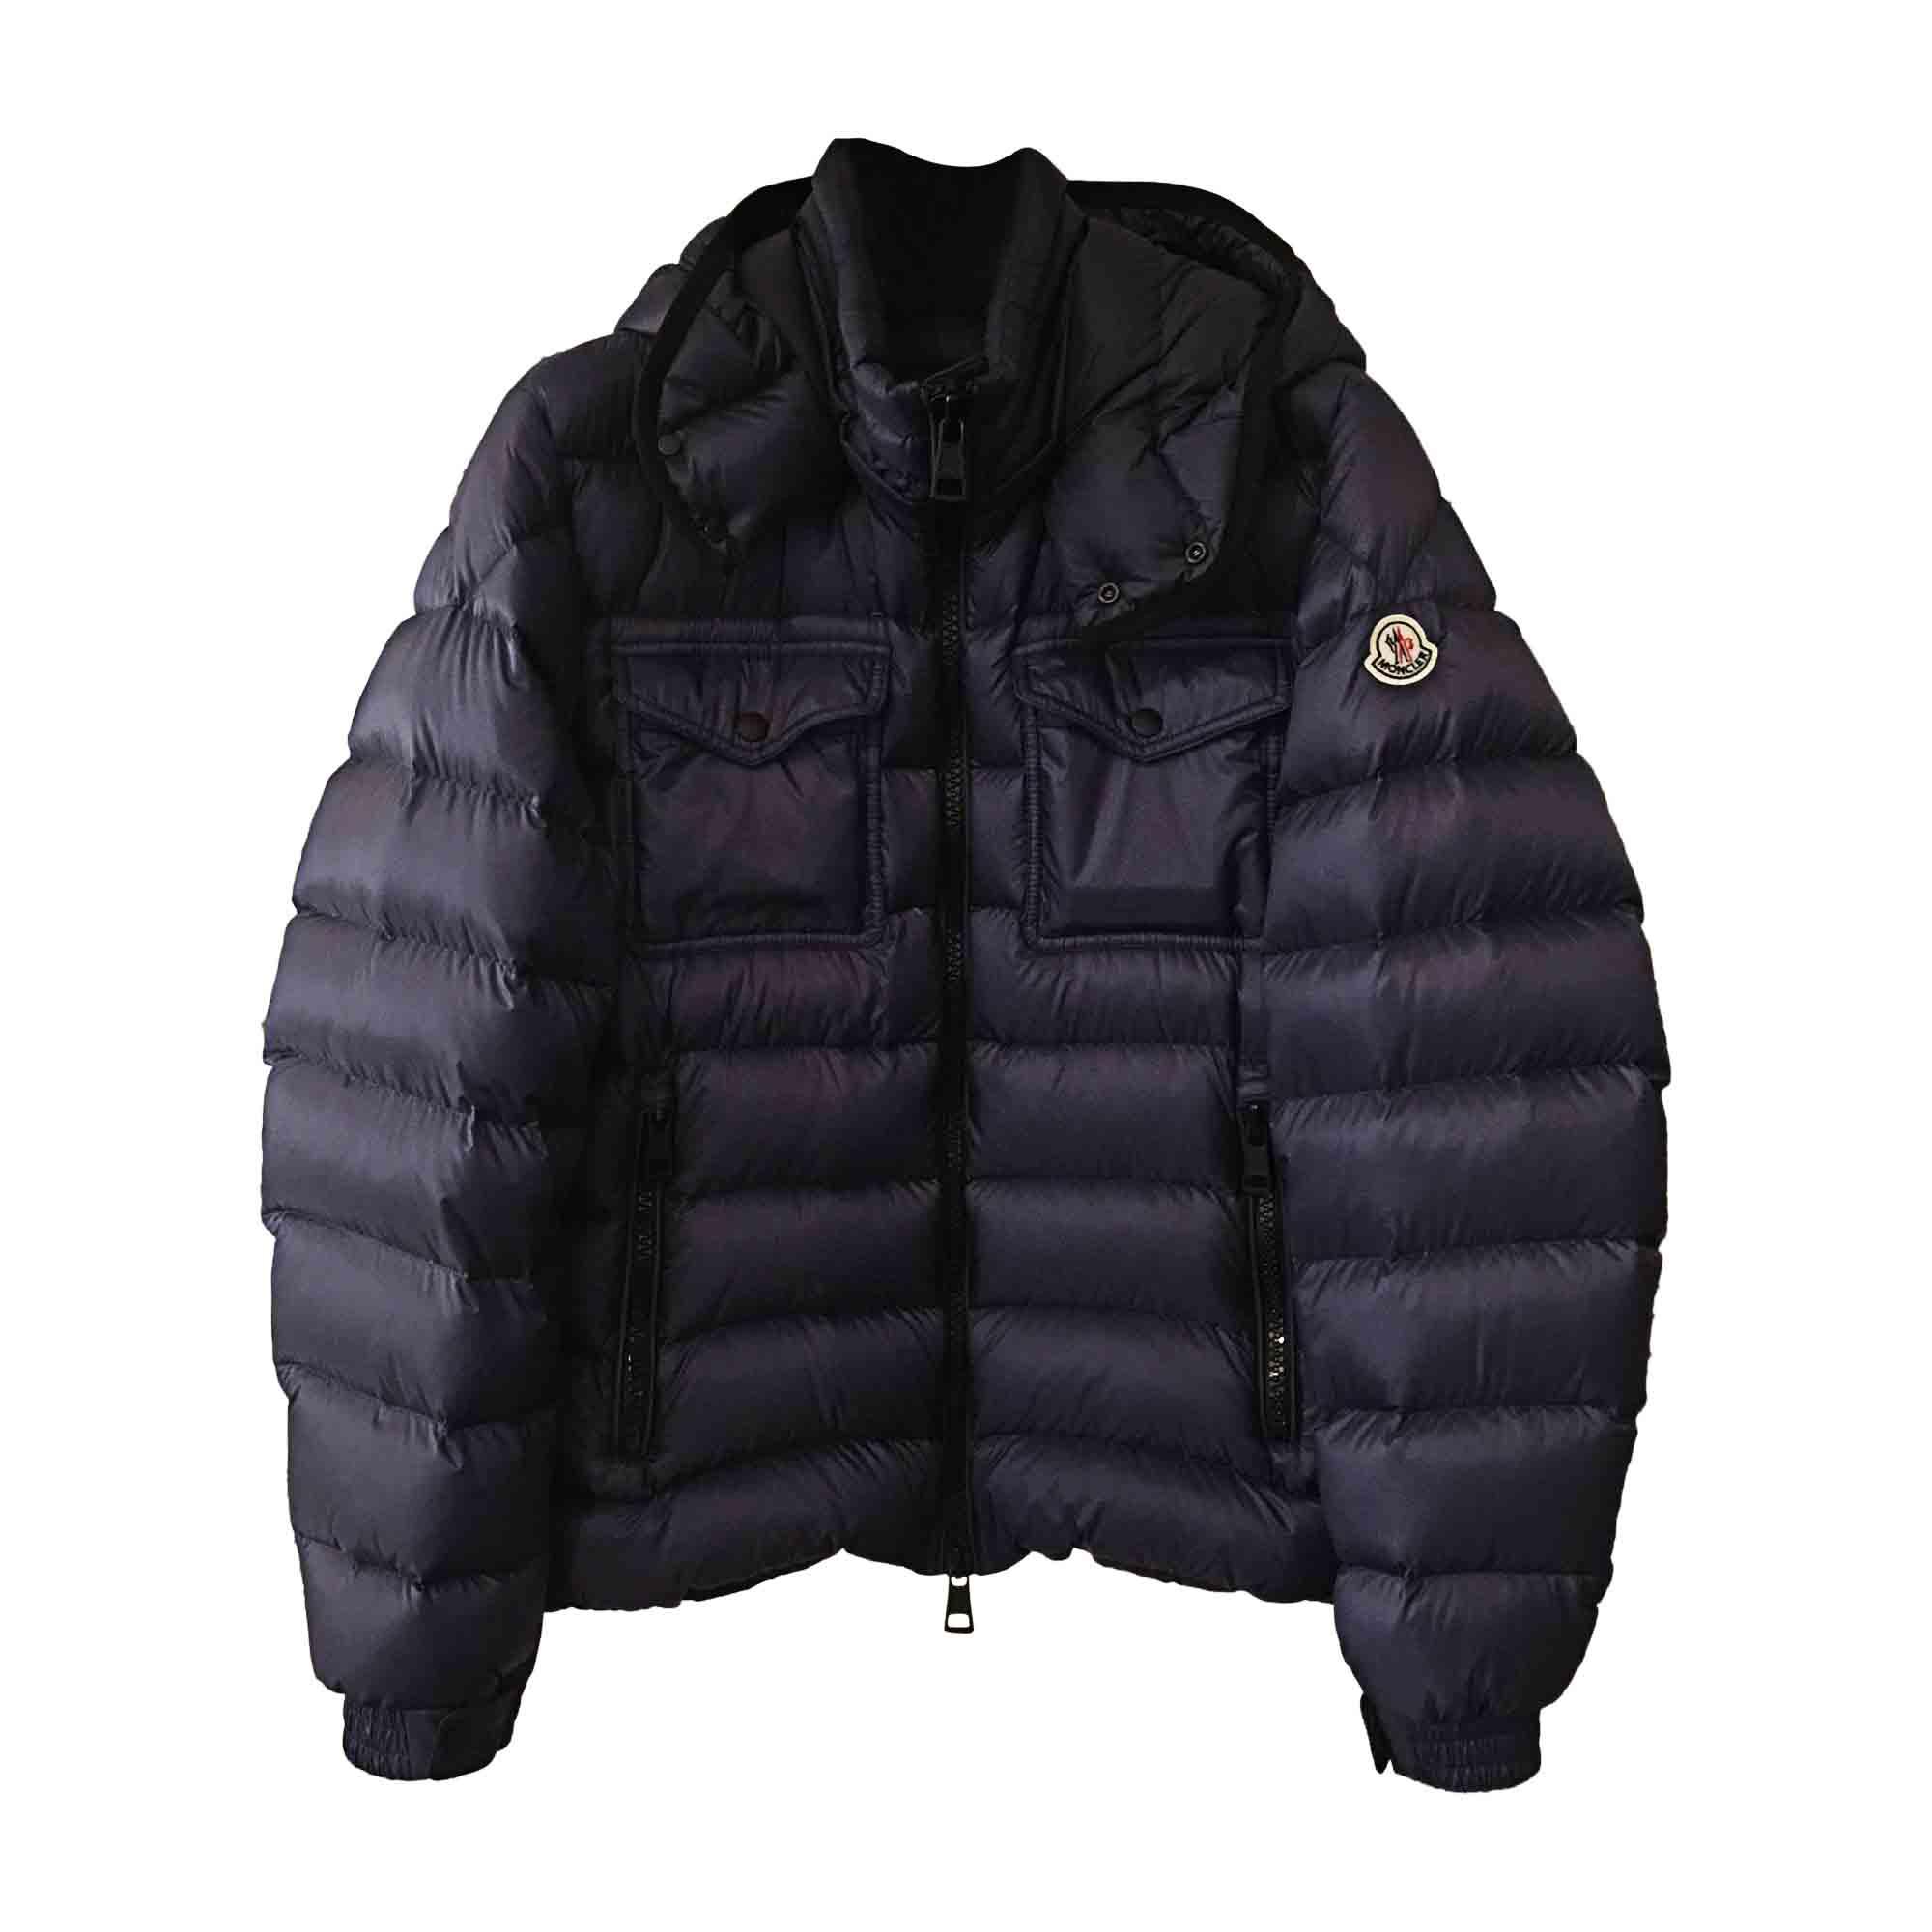 Doudoune MONCLER 50 (M) bleu vendu par Muriel 128477034 - 5862503 a97092ba8e9